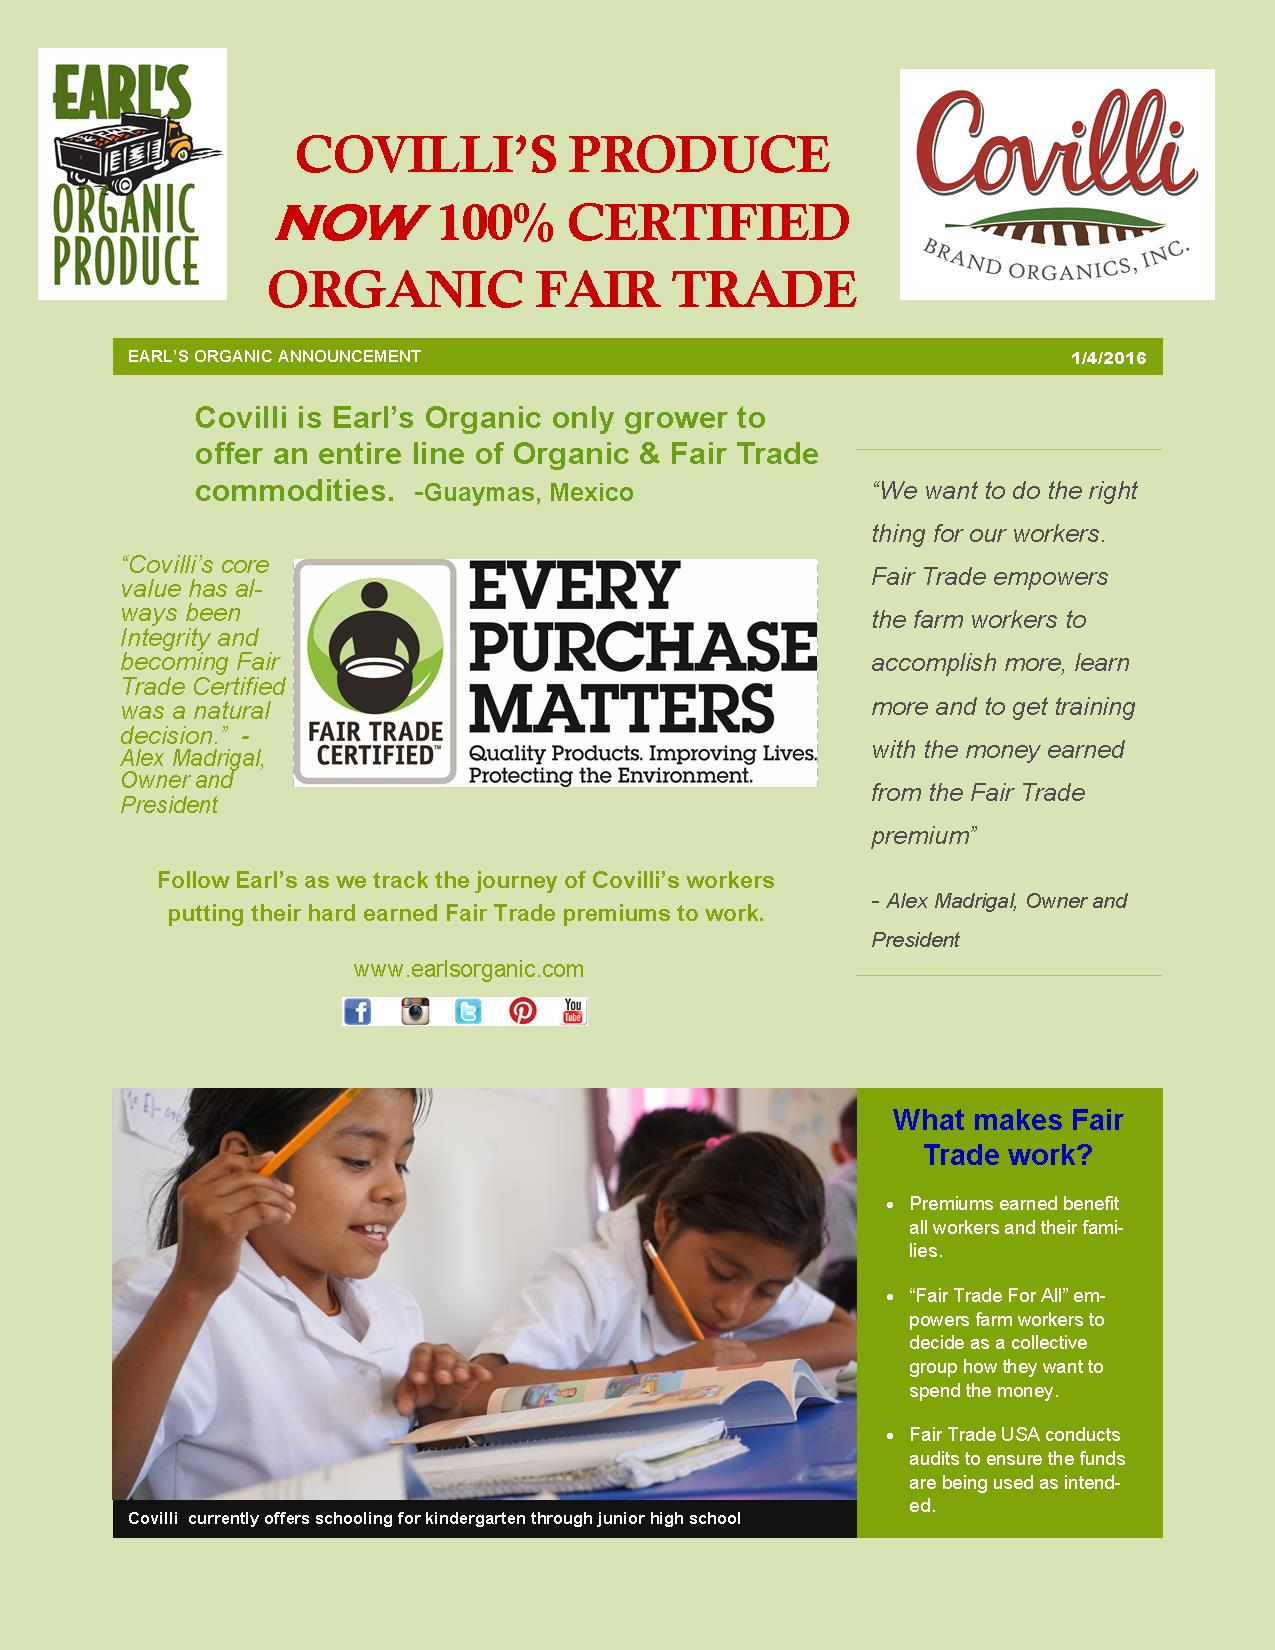 Covilli Fair Trade announcement January 4, 2016